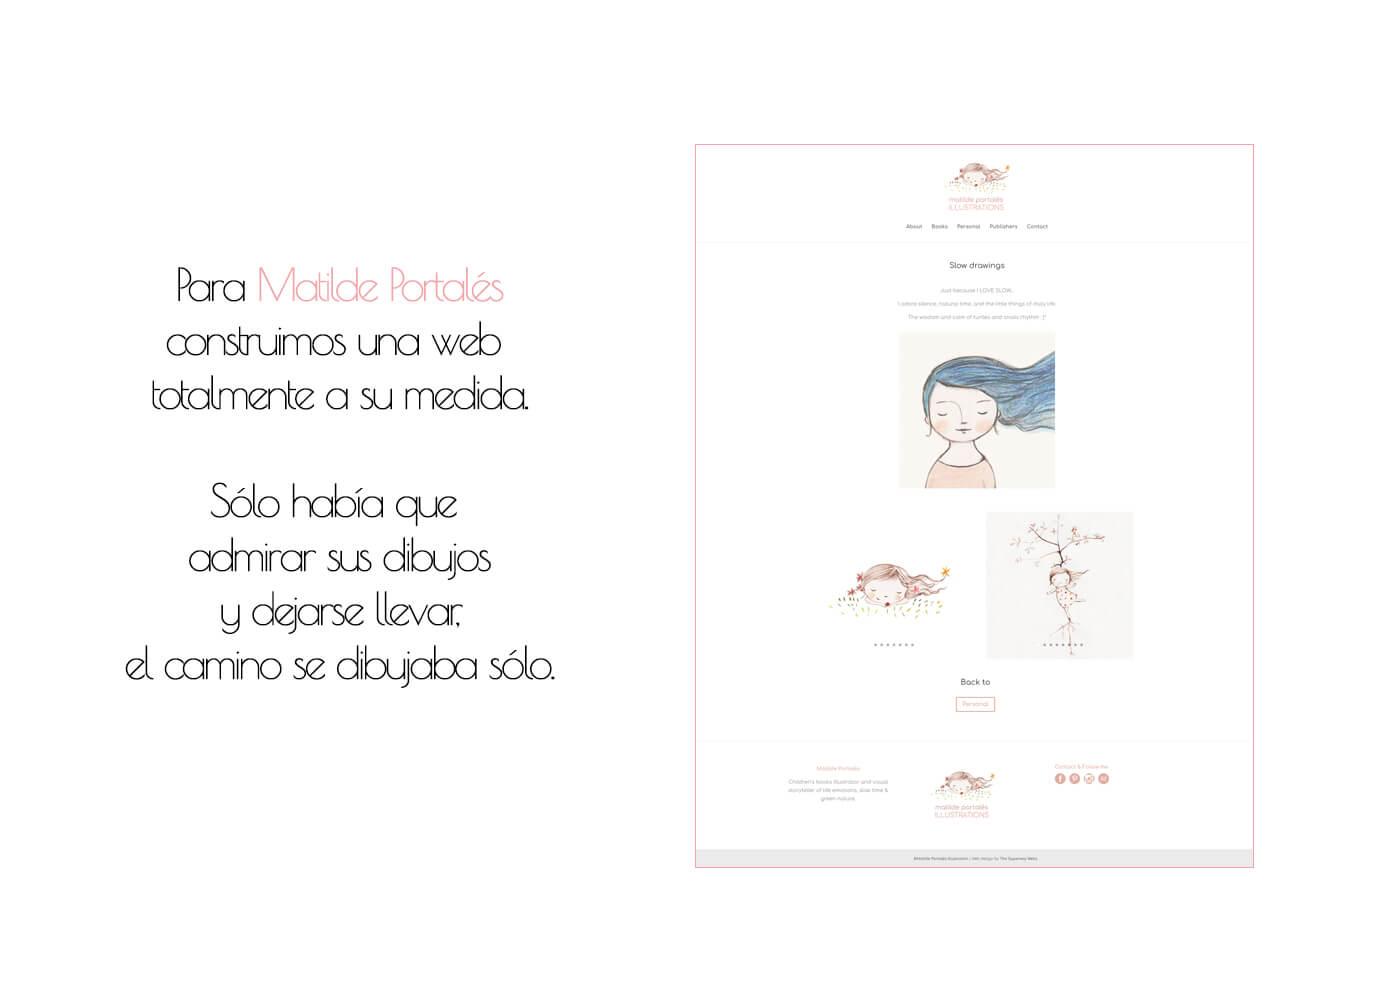 Web Matilde Portalés Illustration Personal | The Superway Webs